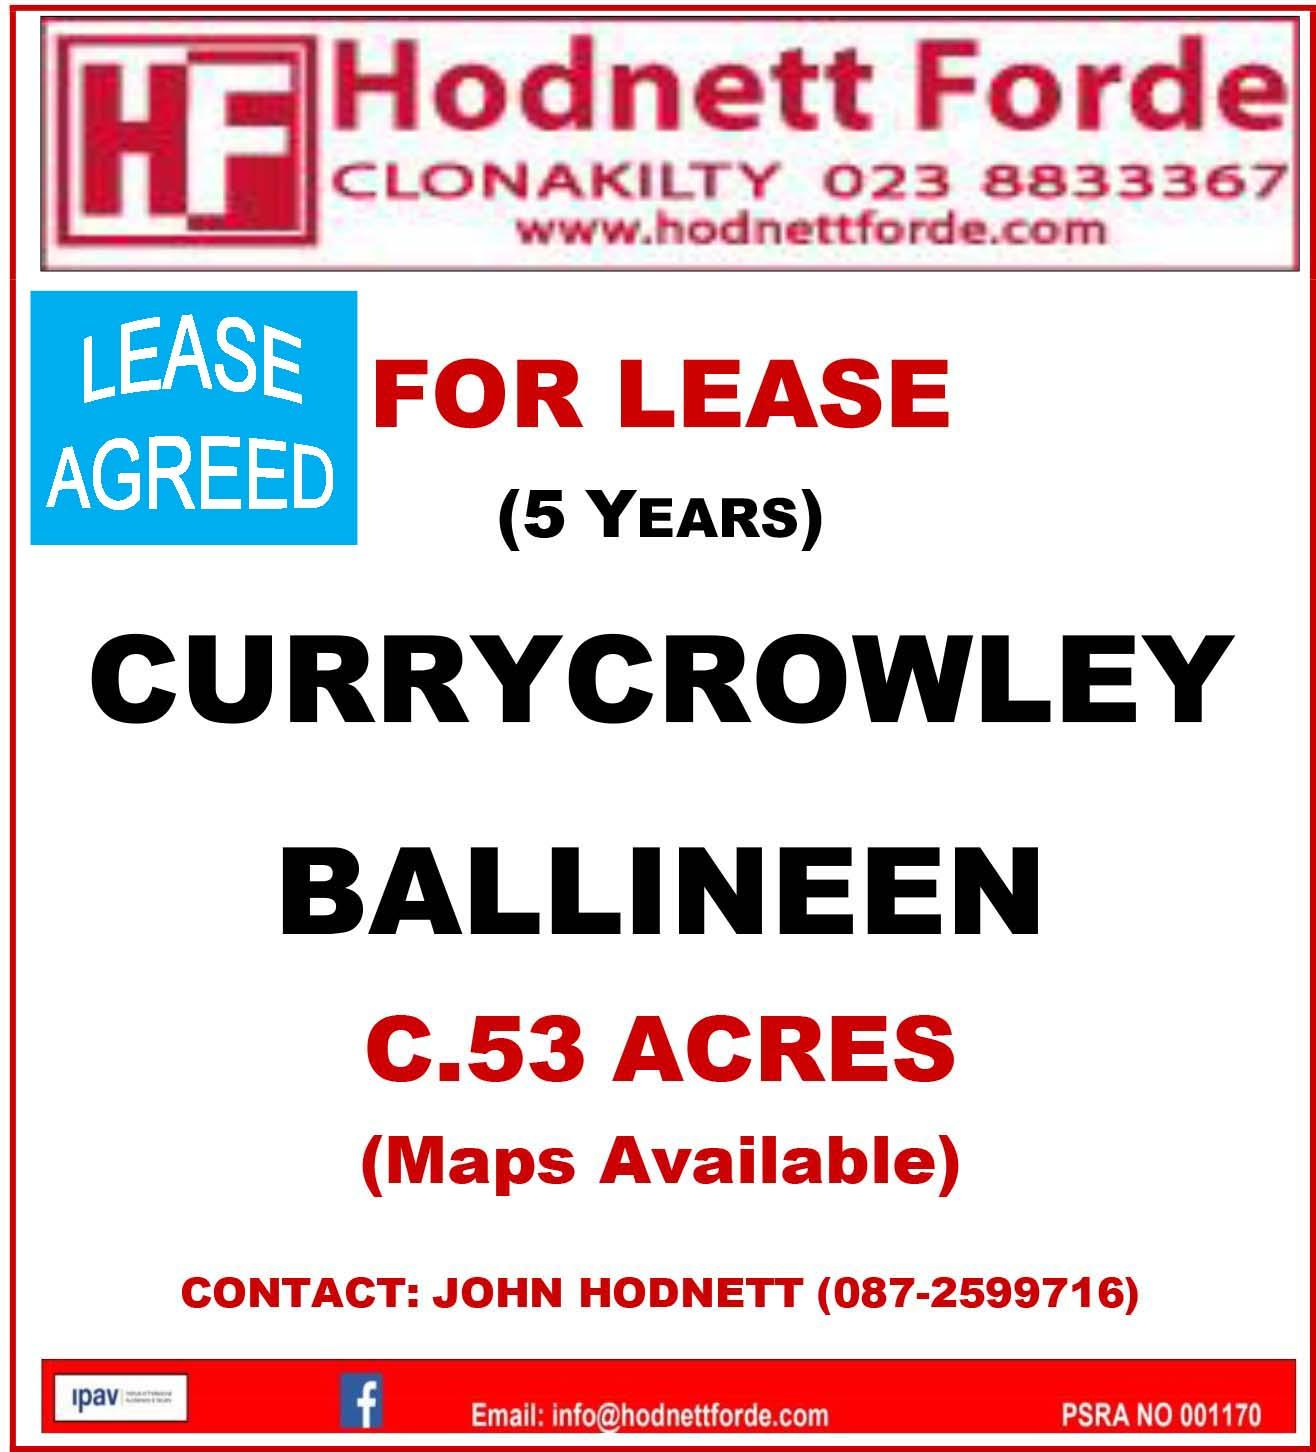 2. Currycrowley, Ballineen